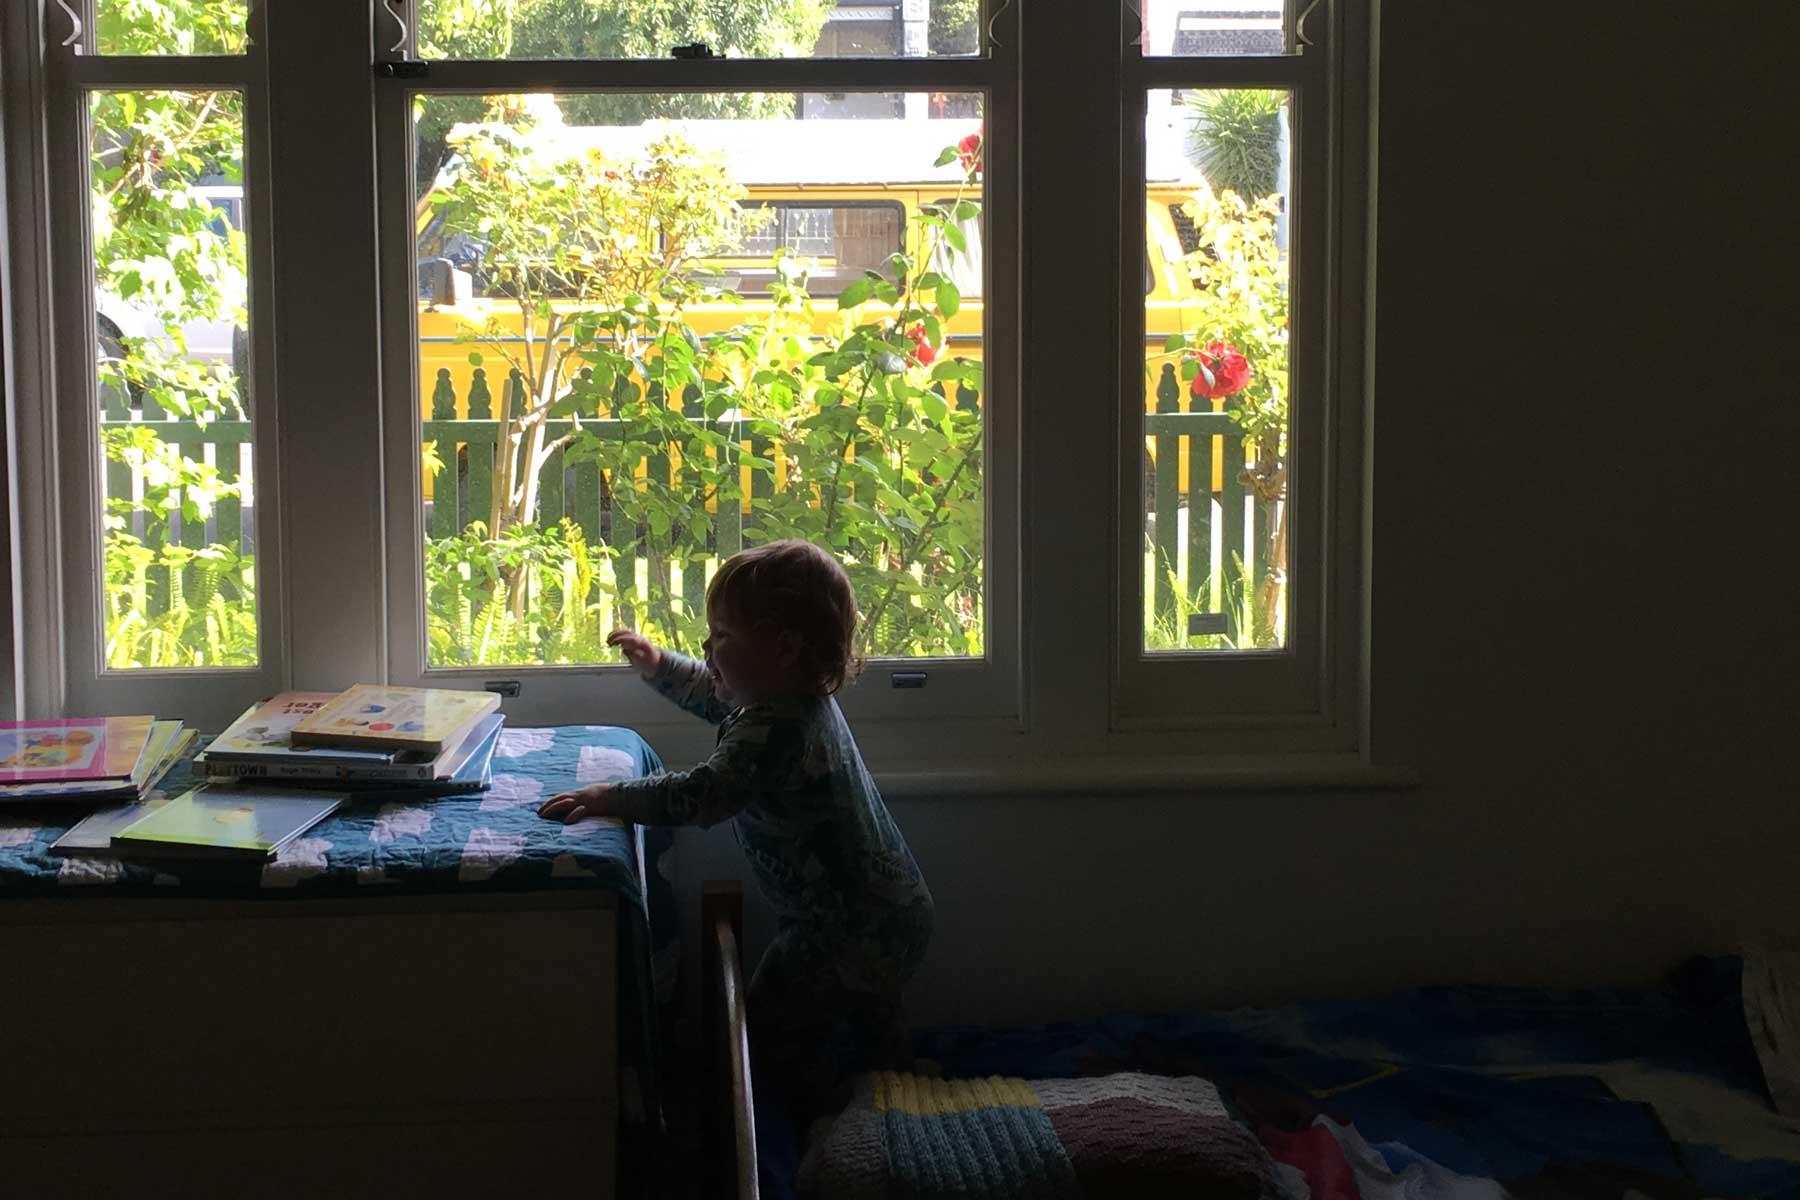 Lauras scandi home office - before - child window